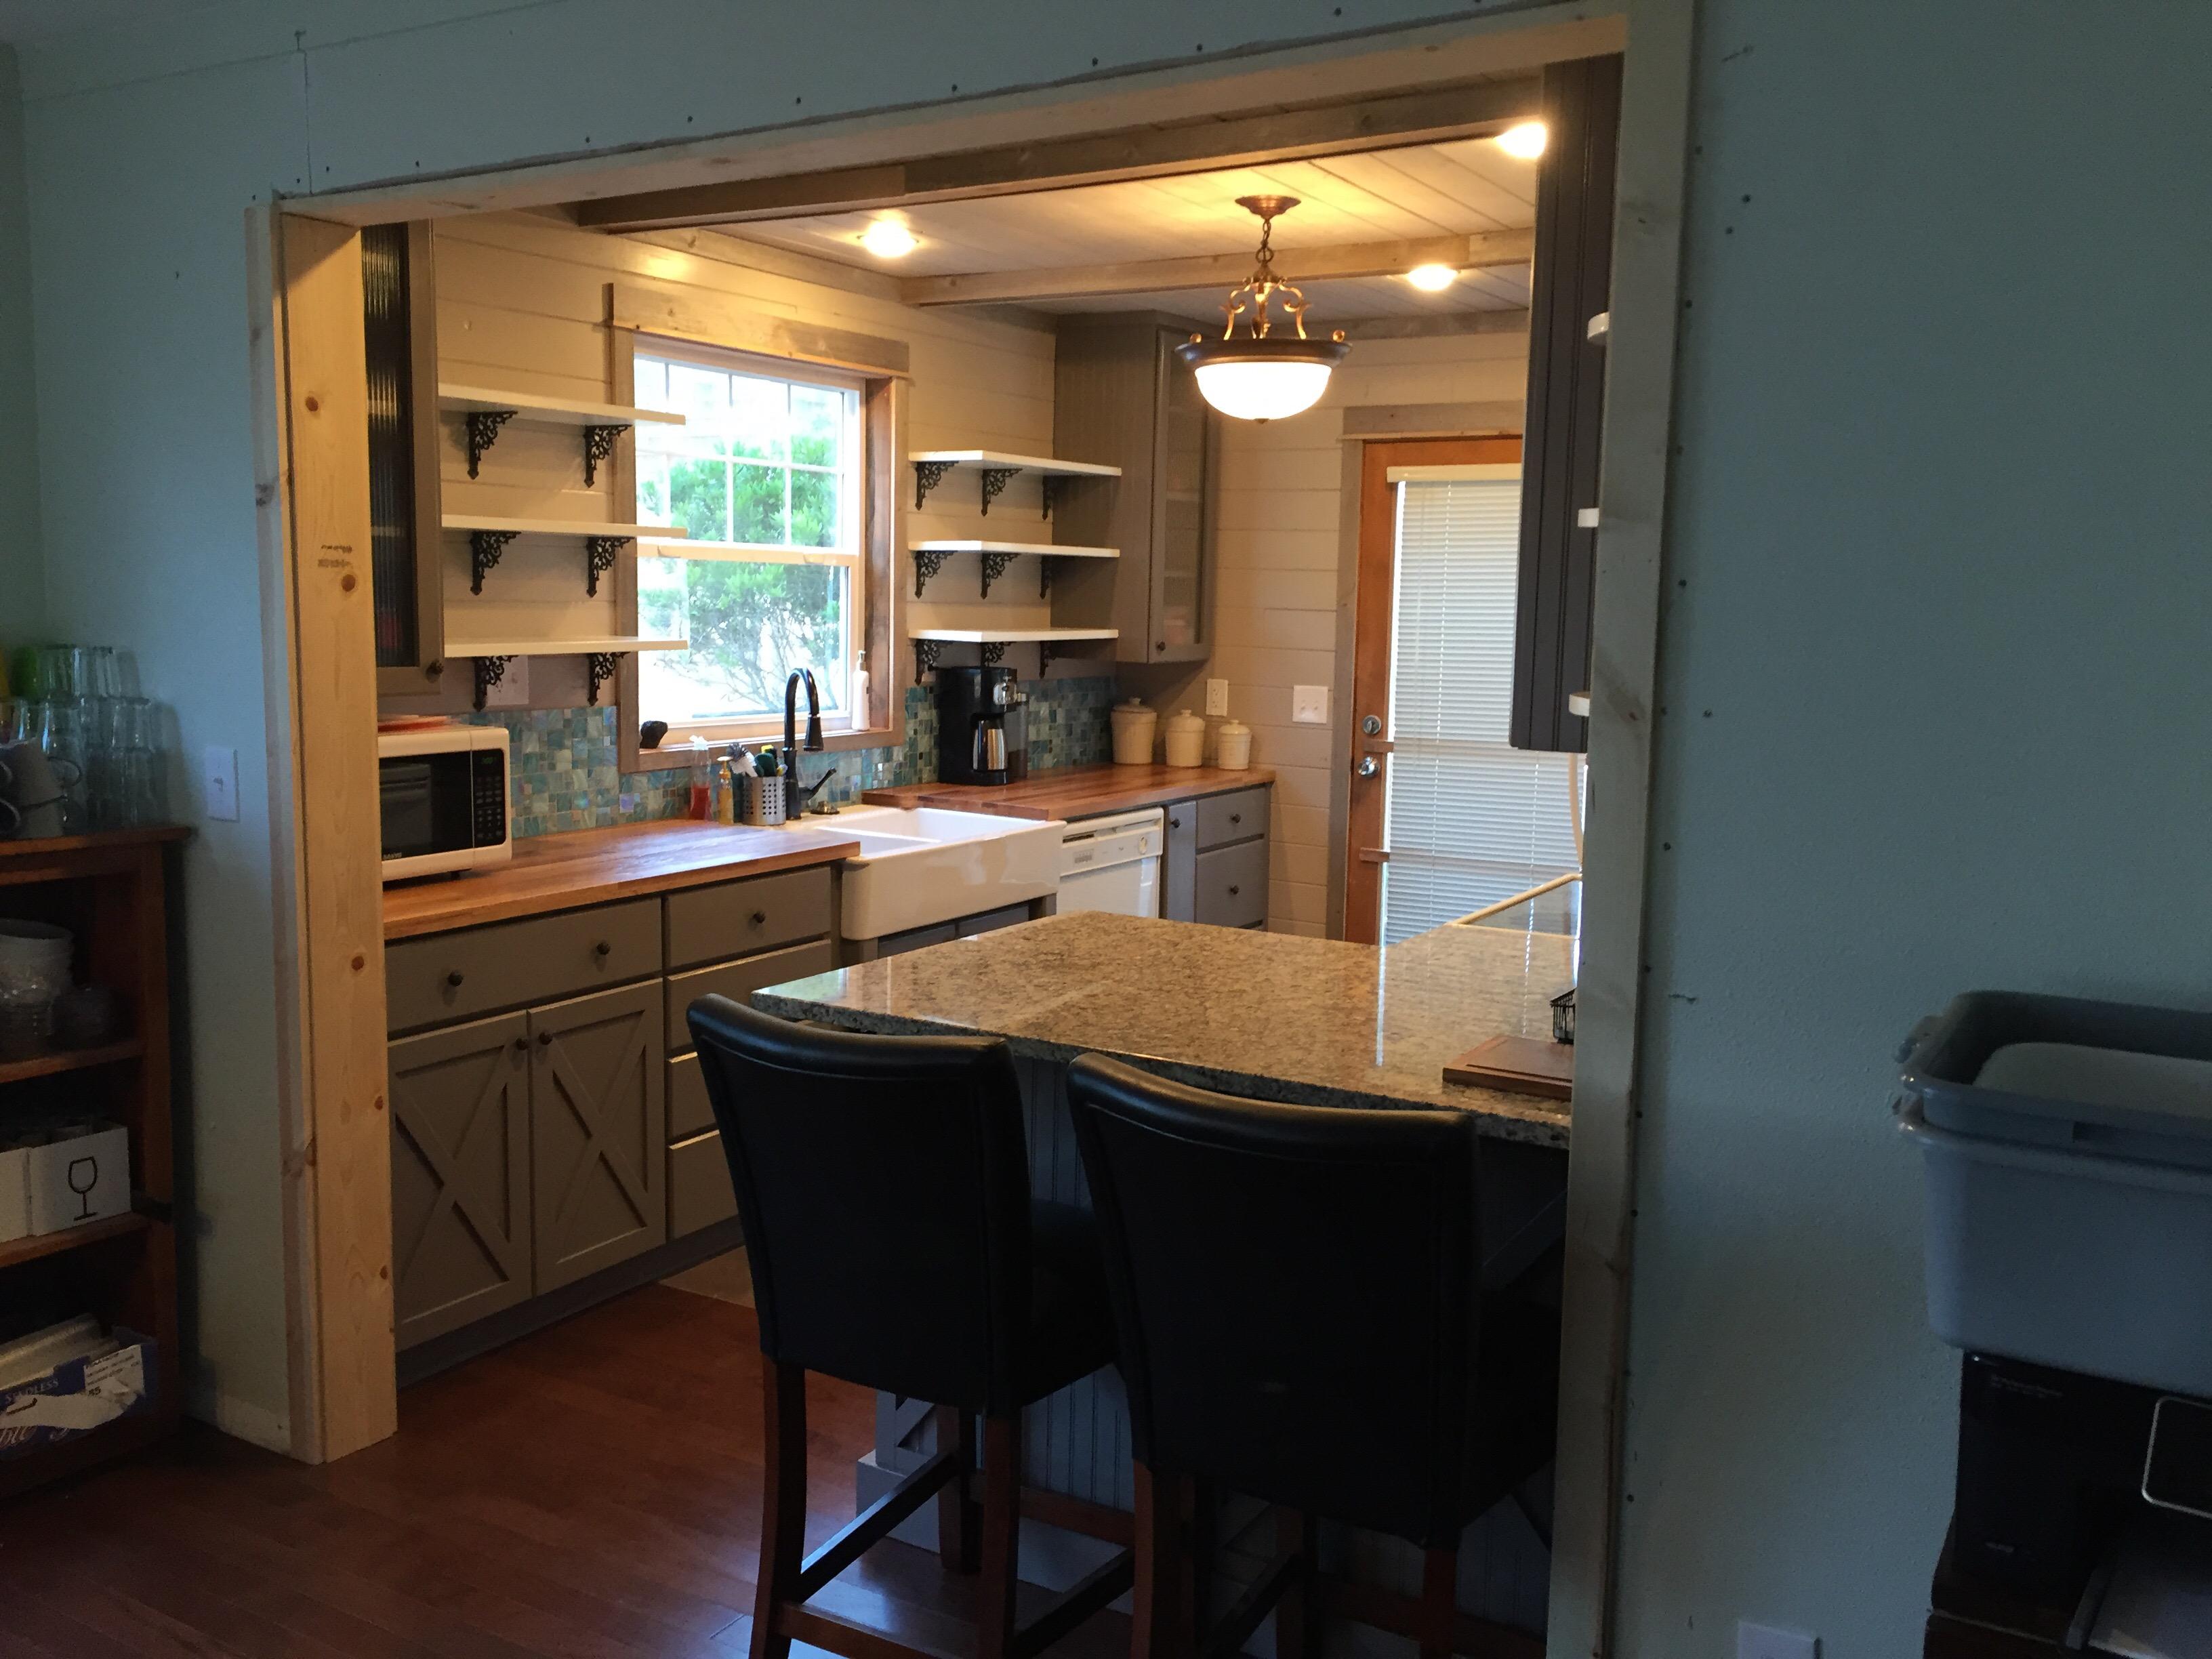 10k Kitchen Remodel I Started A Parent Site Greengate